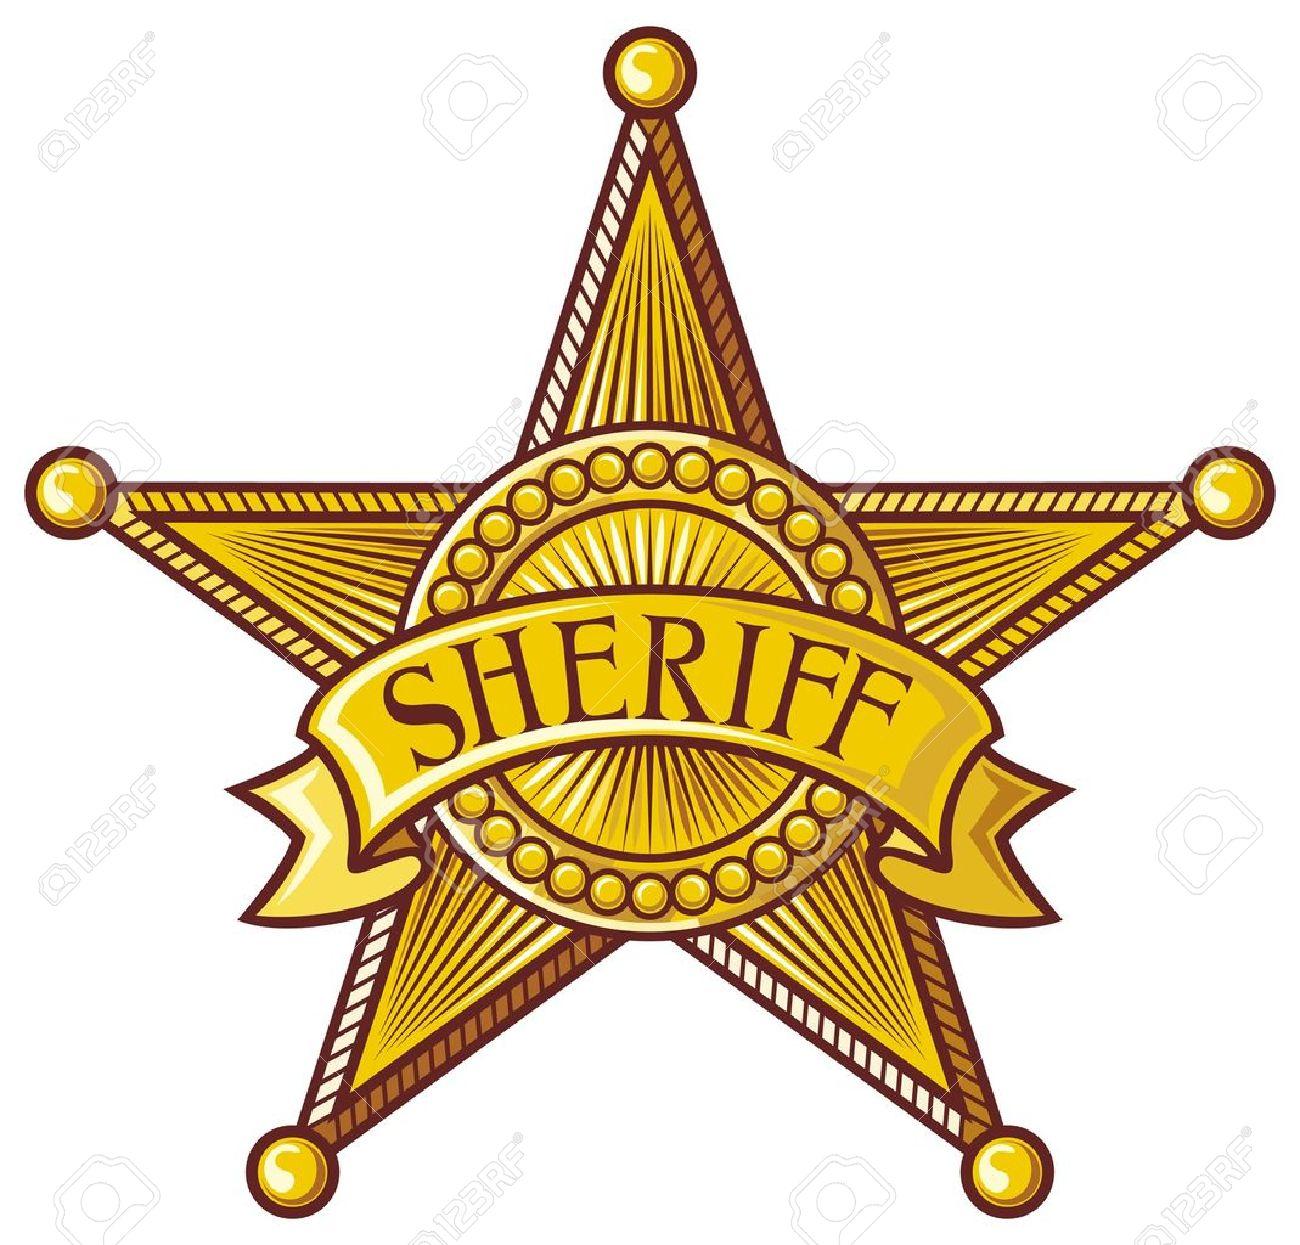 vector sheriff s star sheriff badge sheriff shield royalty free rh 123rf com deputy sheriff badge clipart sheriff badge clip art free